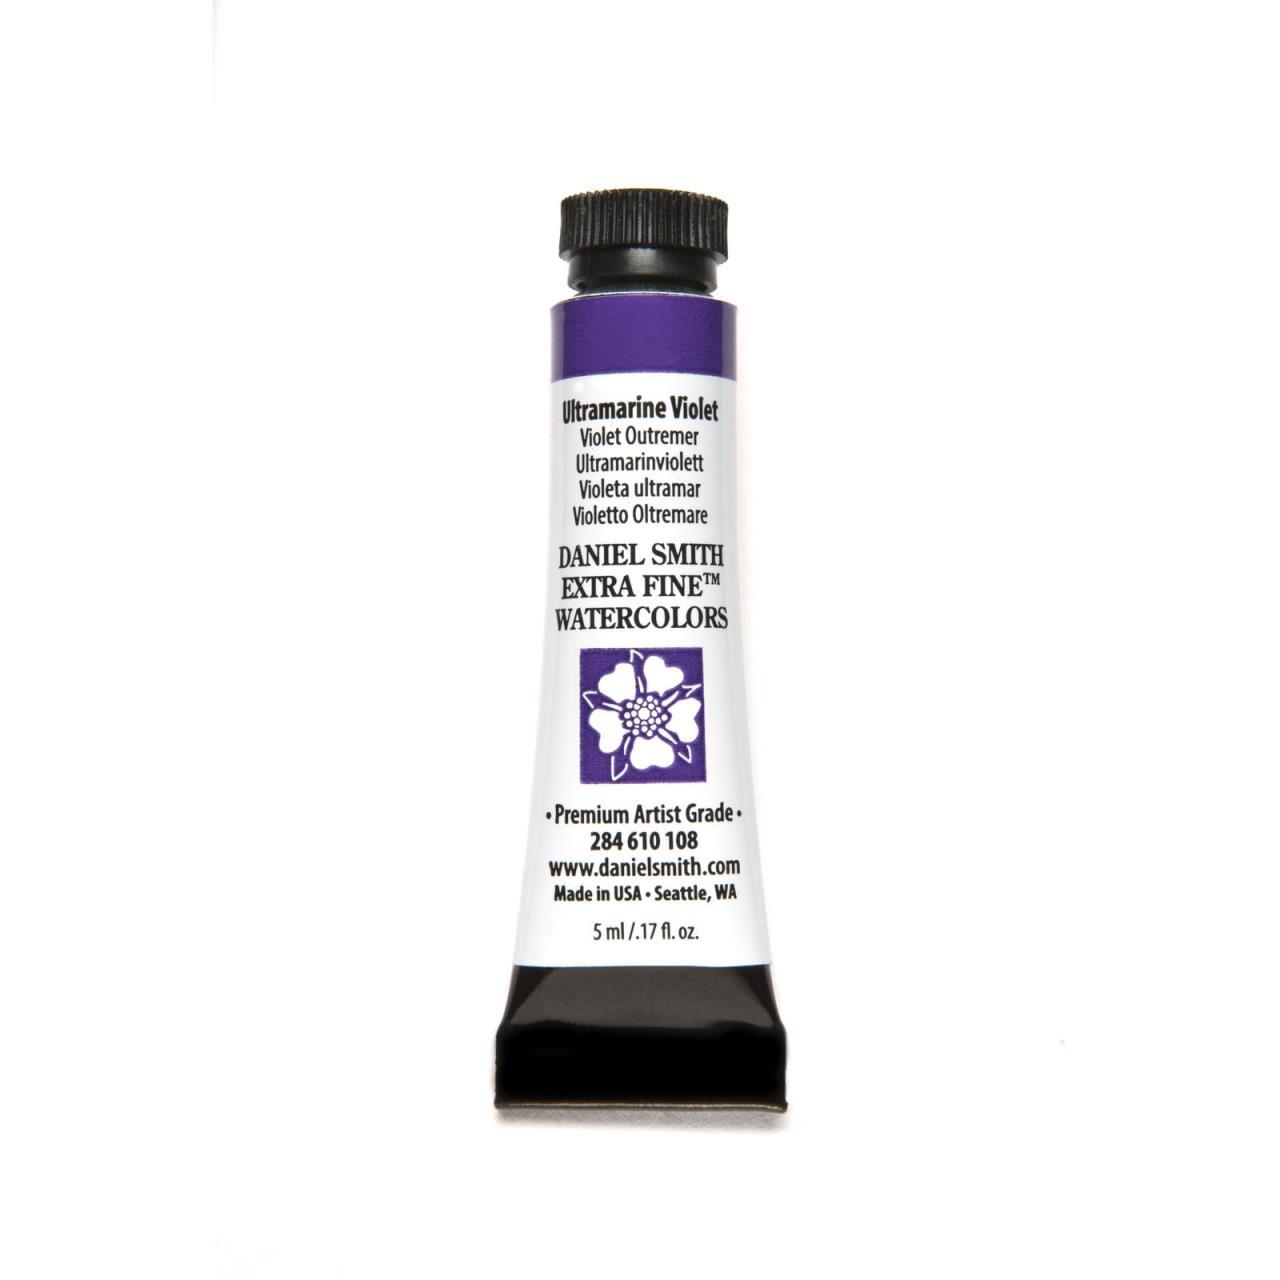 Ultramarine Violet, DANIEL SMITH Extra Fine Watercolors 5ml Tubes -